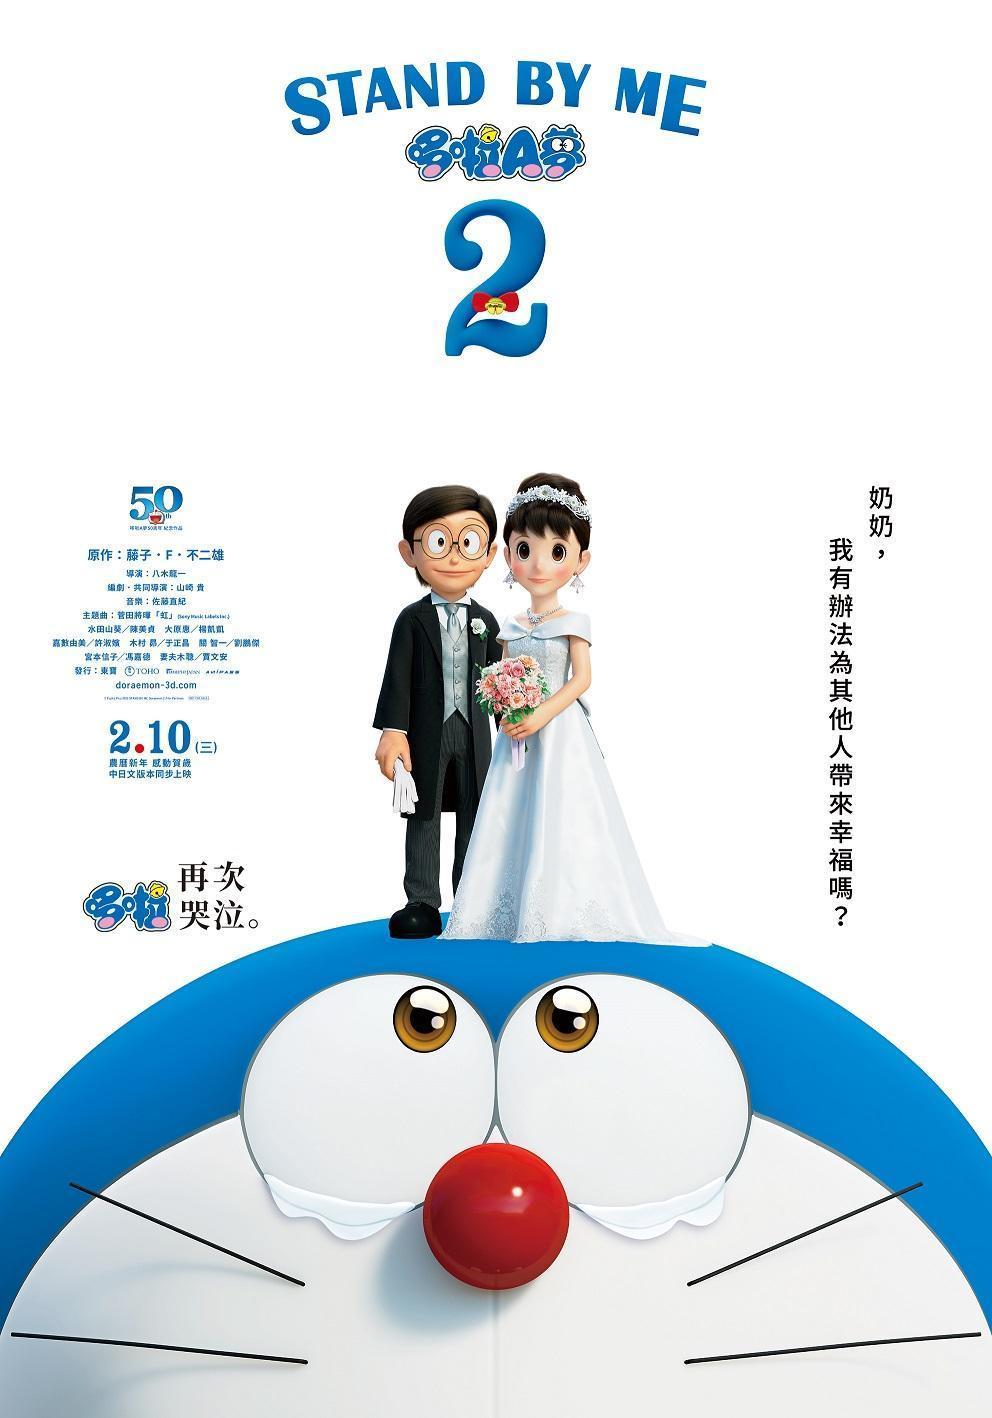 3D動畫電影《STAND BY ME 哆啦A夢2》將於明年農曆春節在台上映。(車庫娛樂提供)